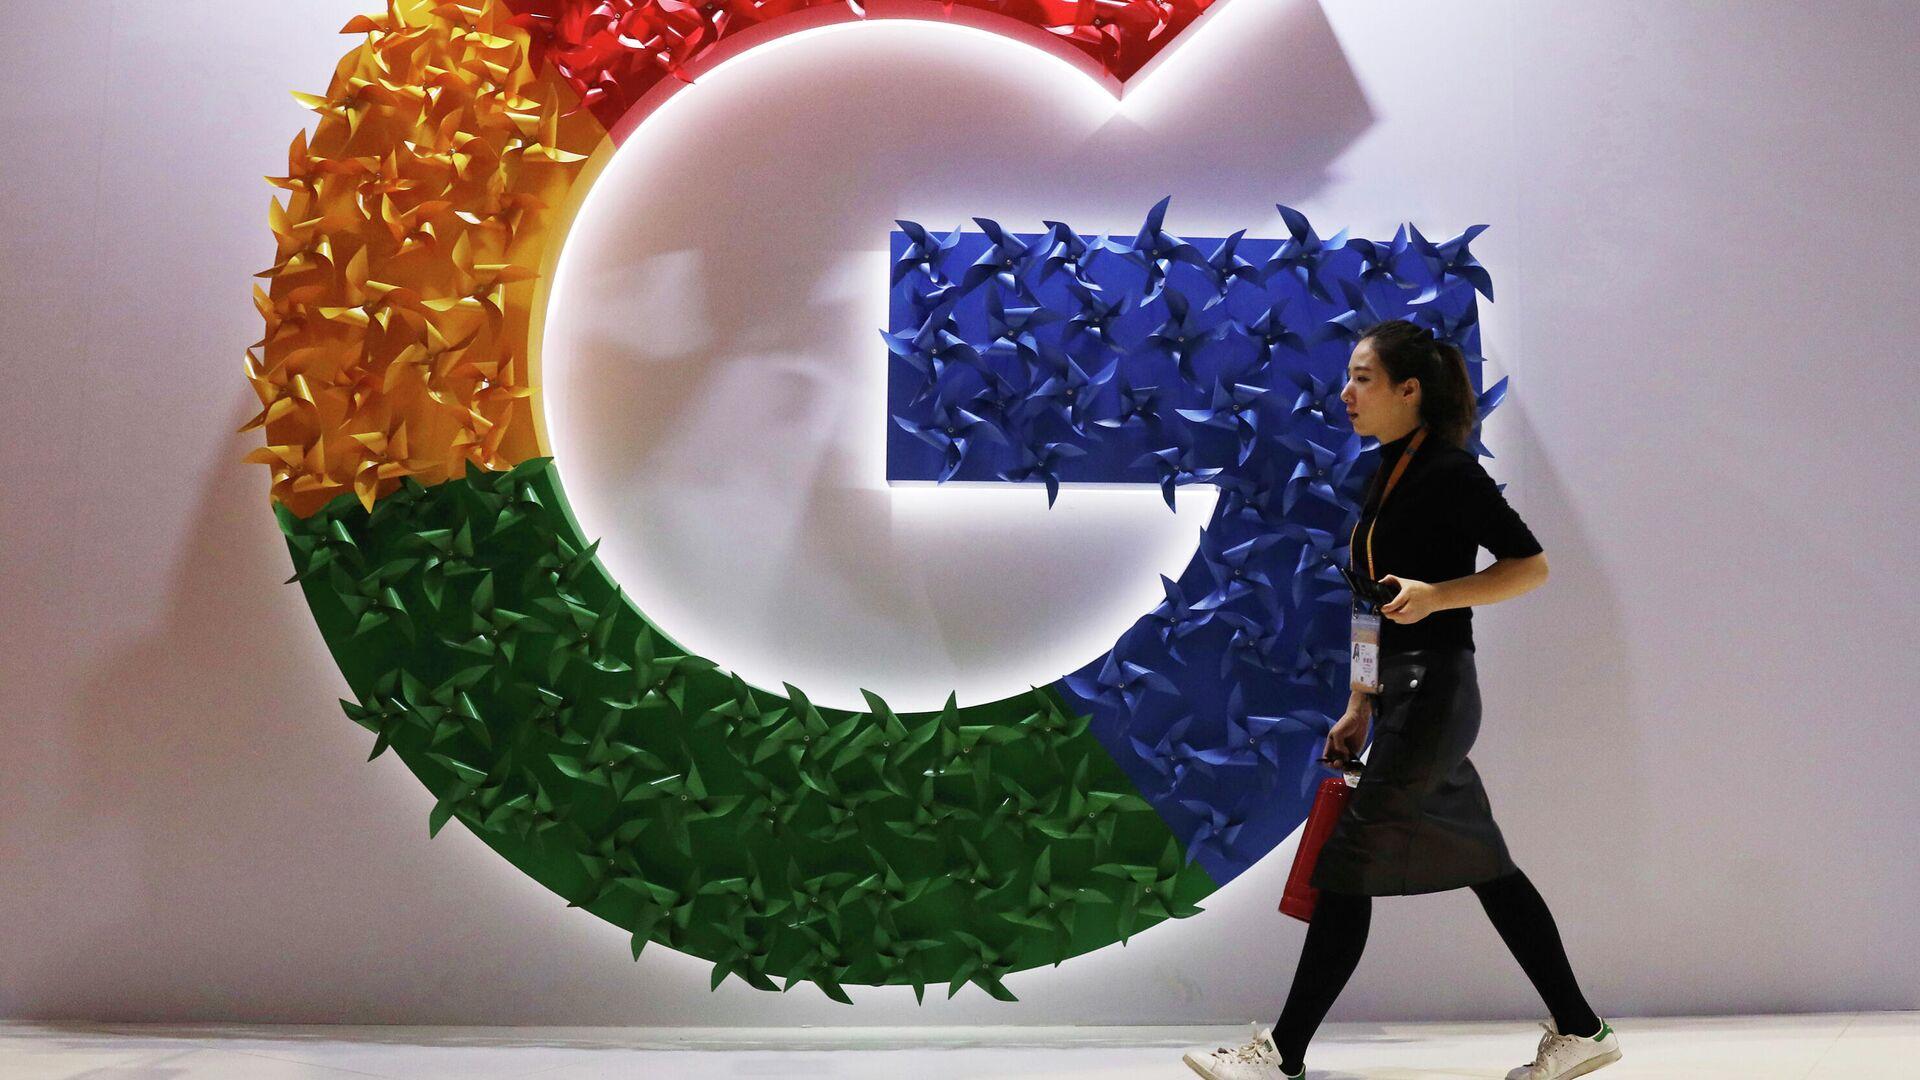 Роскомнадзор пригрозил штрафом Google за блокировку немецких каналов RT на Youtube